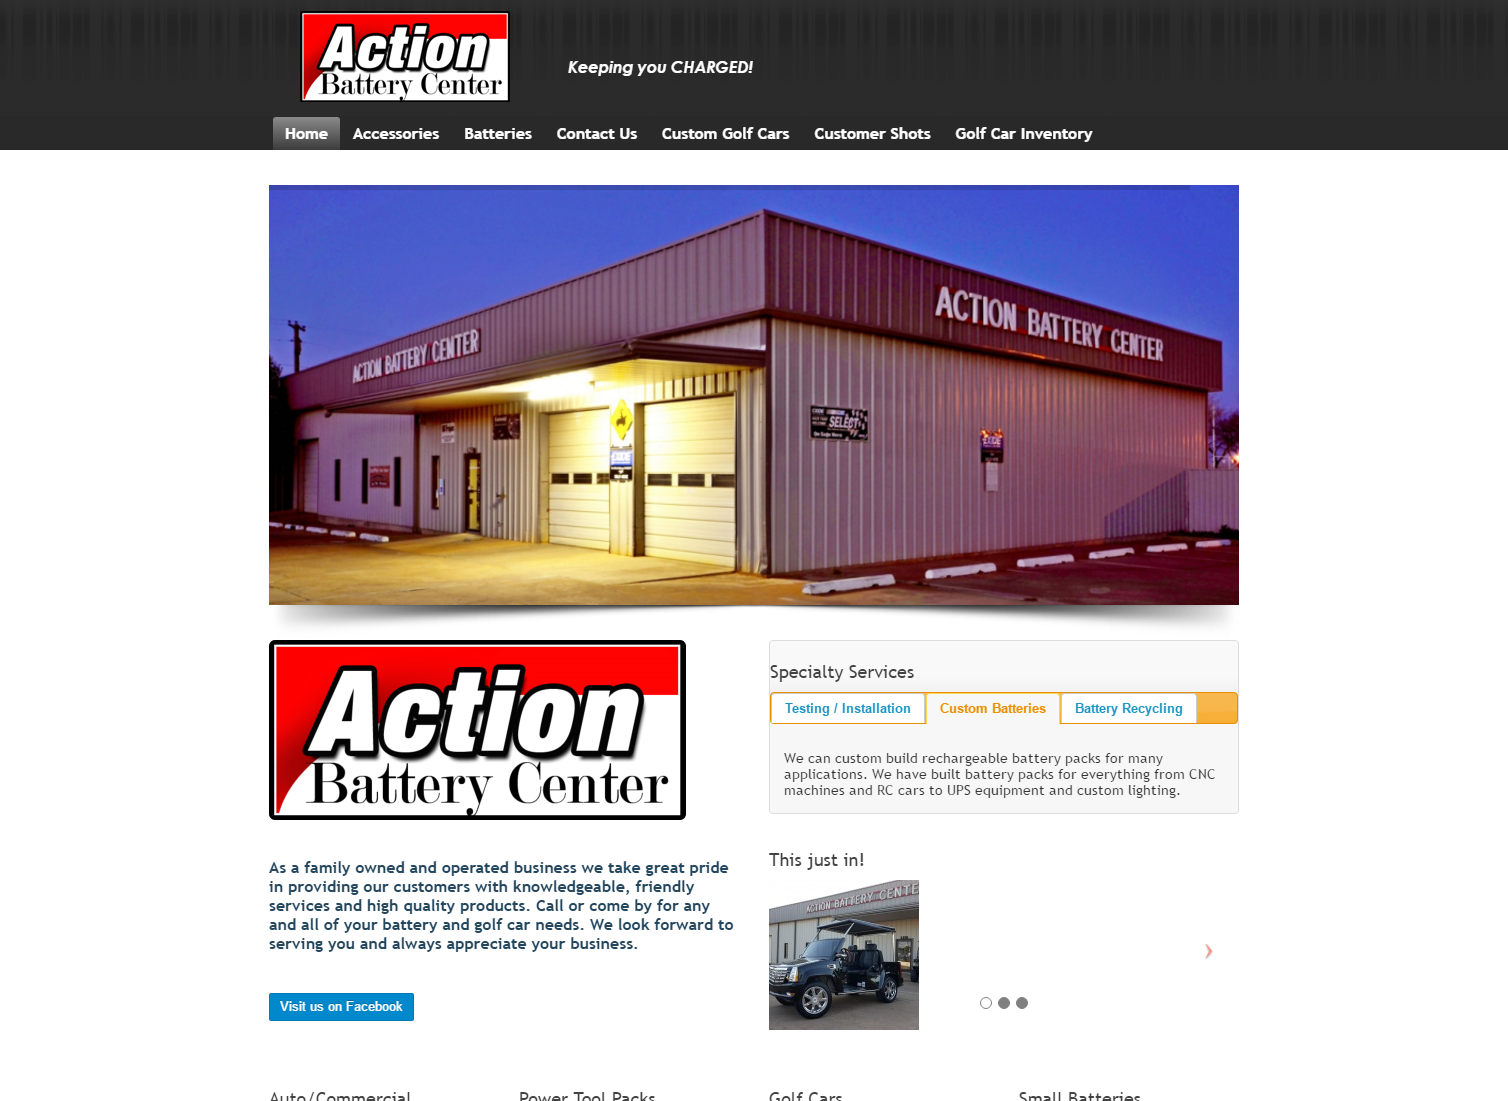 actionbattery001